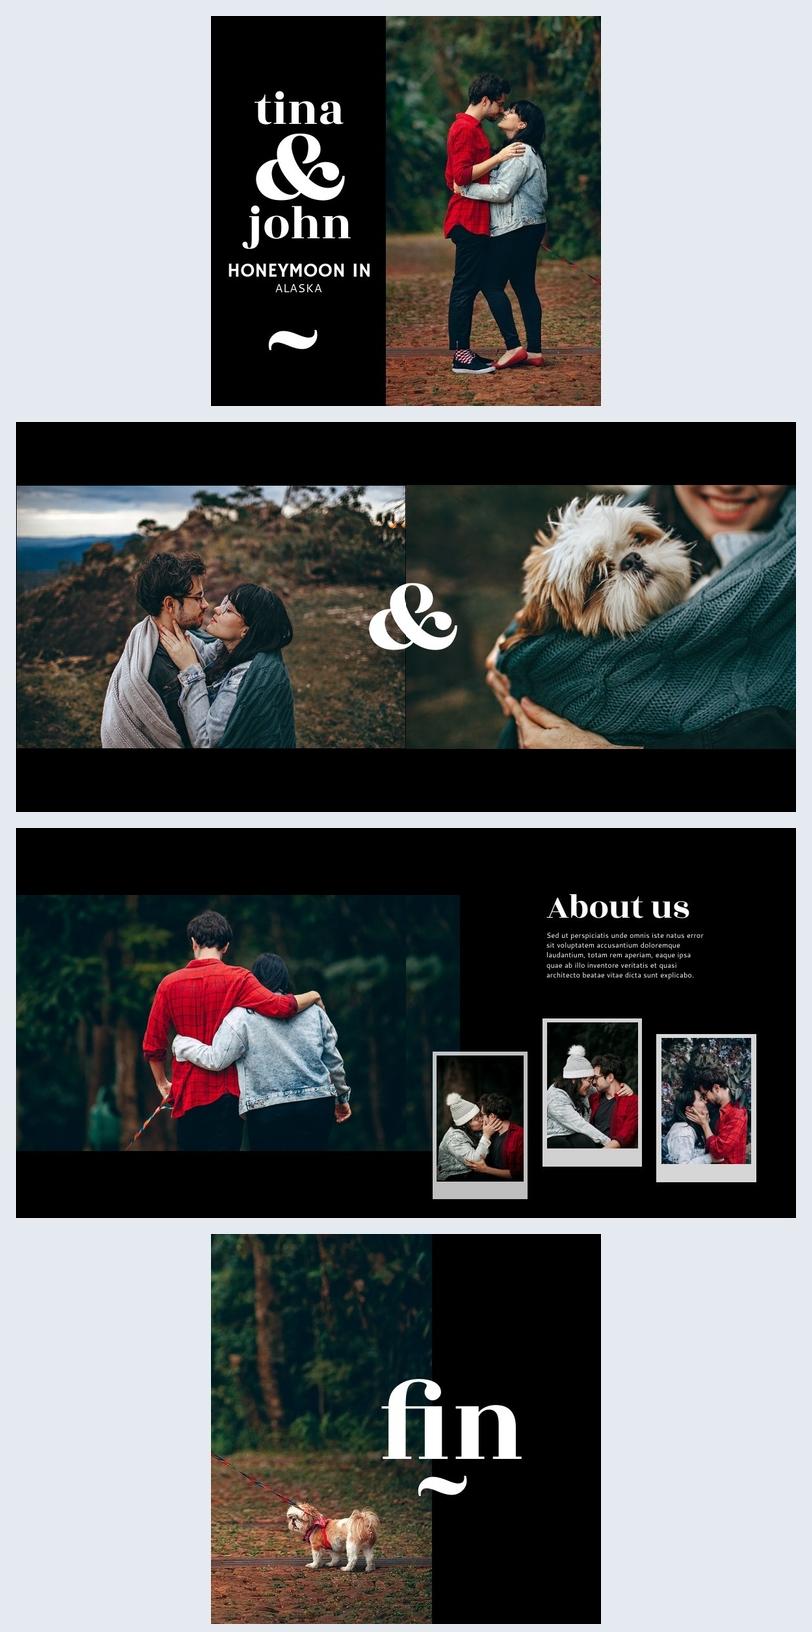 Honeymoon Photo Album Template